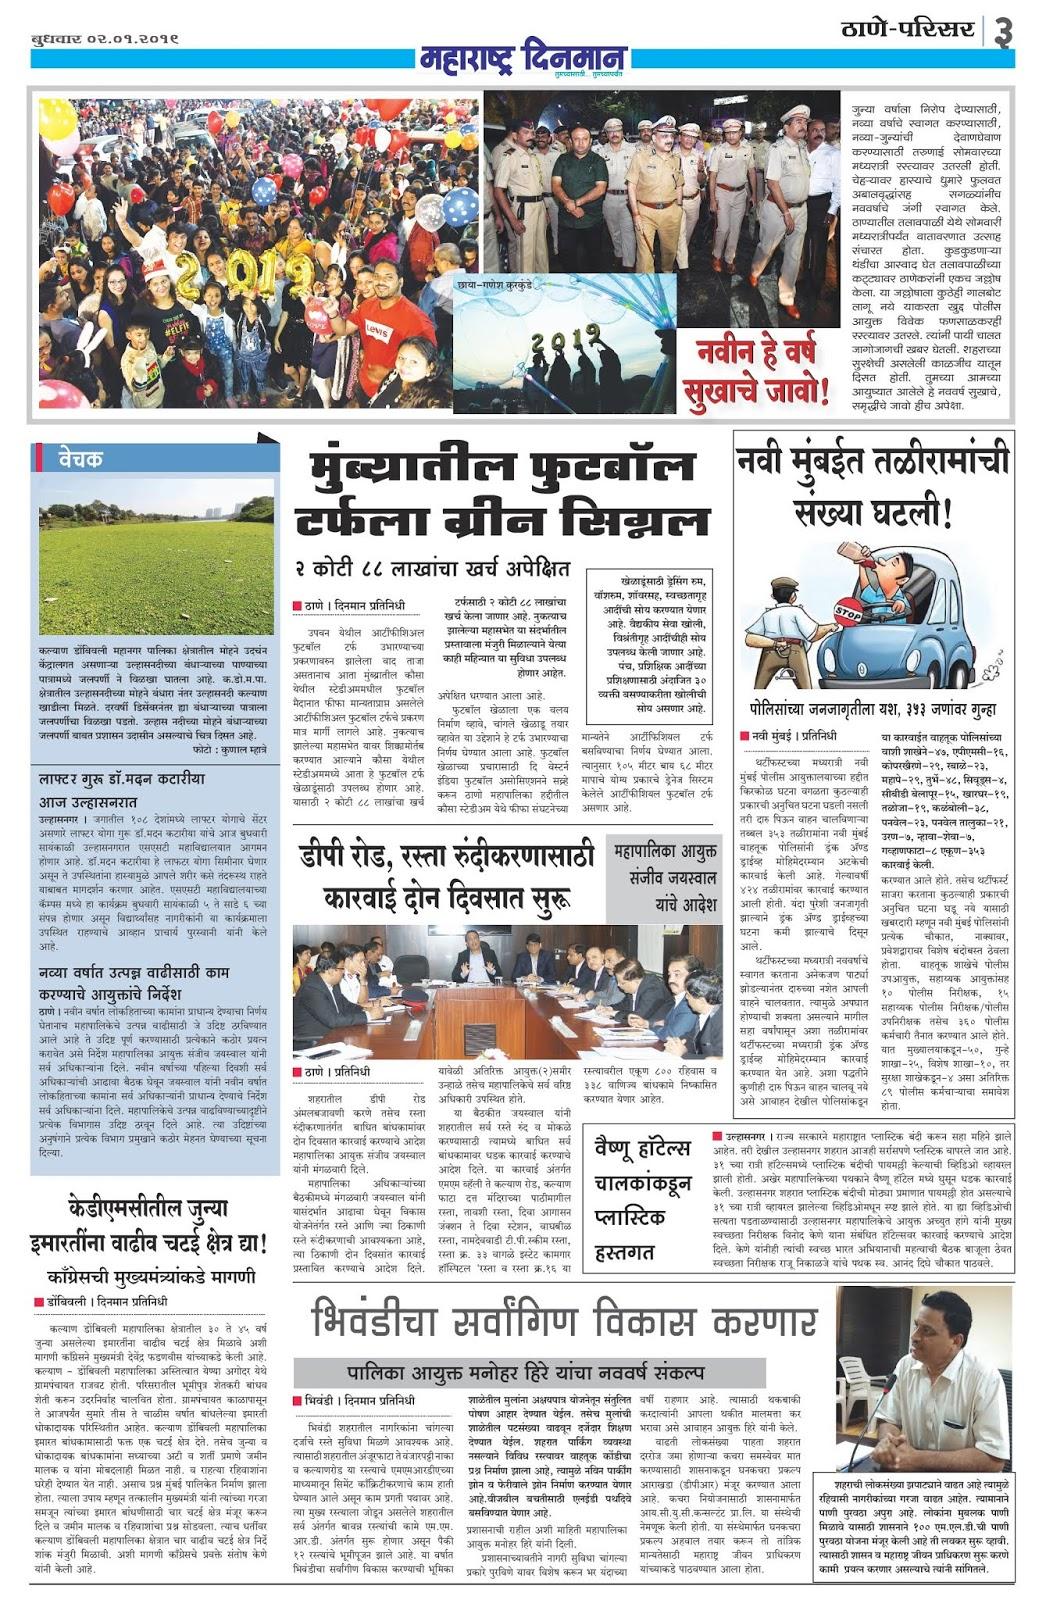 Thane Marathi Daily Newspaper Maharashtra Dinman 02-01-2019, Page 3